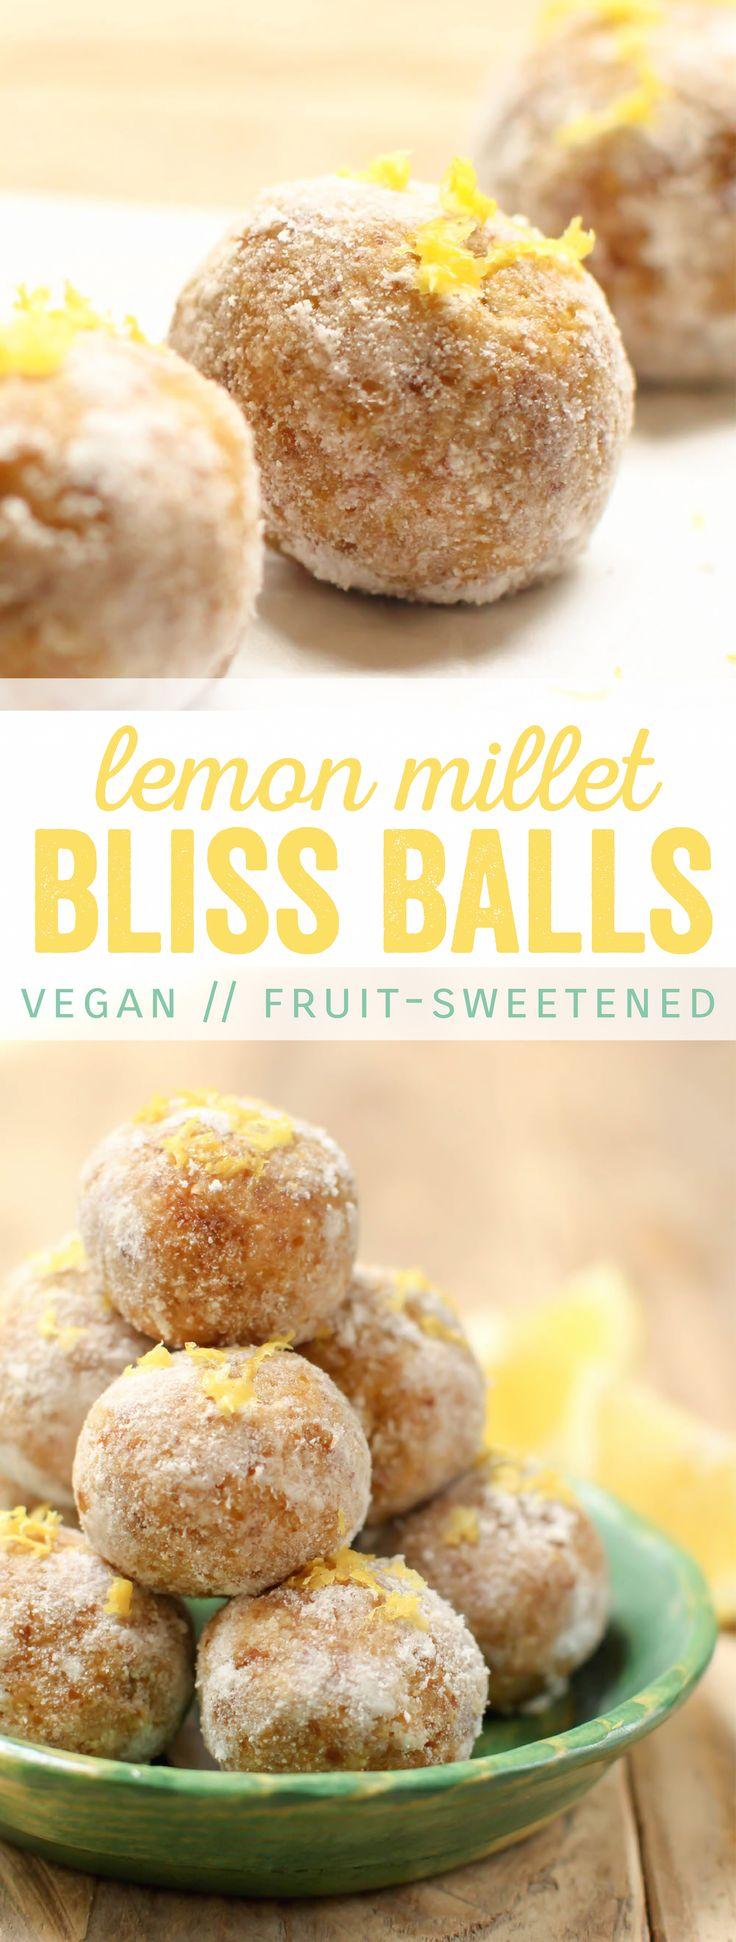 Lemon Millet Bliss INGREDIENTS 1 cup (about 12) pitted Medjool dates 1 cup cooked millet 1 cup oat flour Juice of ½ a lemon Zest of 1 lemon Optional: 2 tbsps coconut milk powder